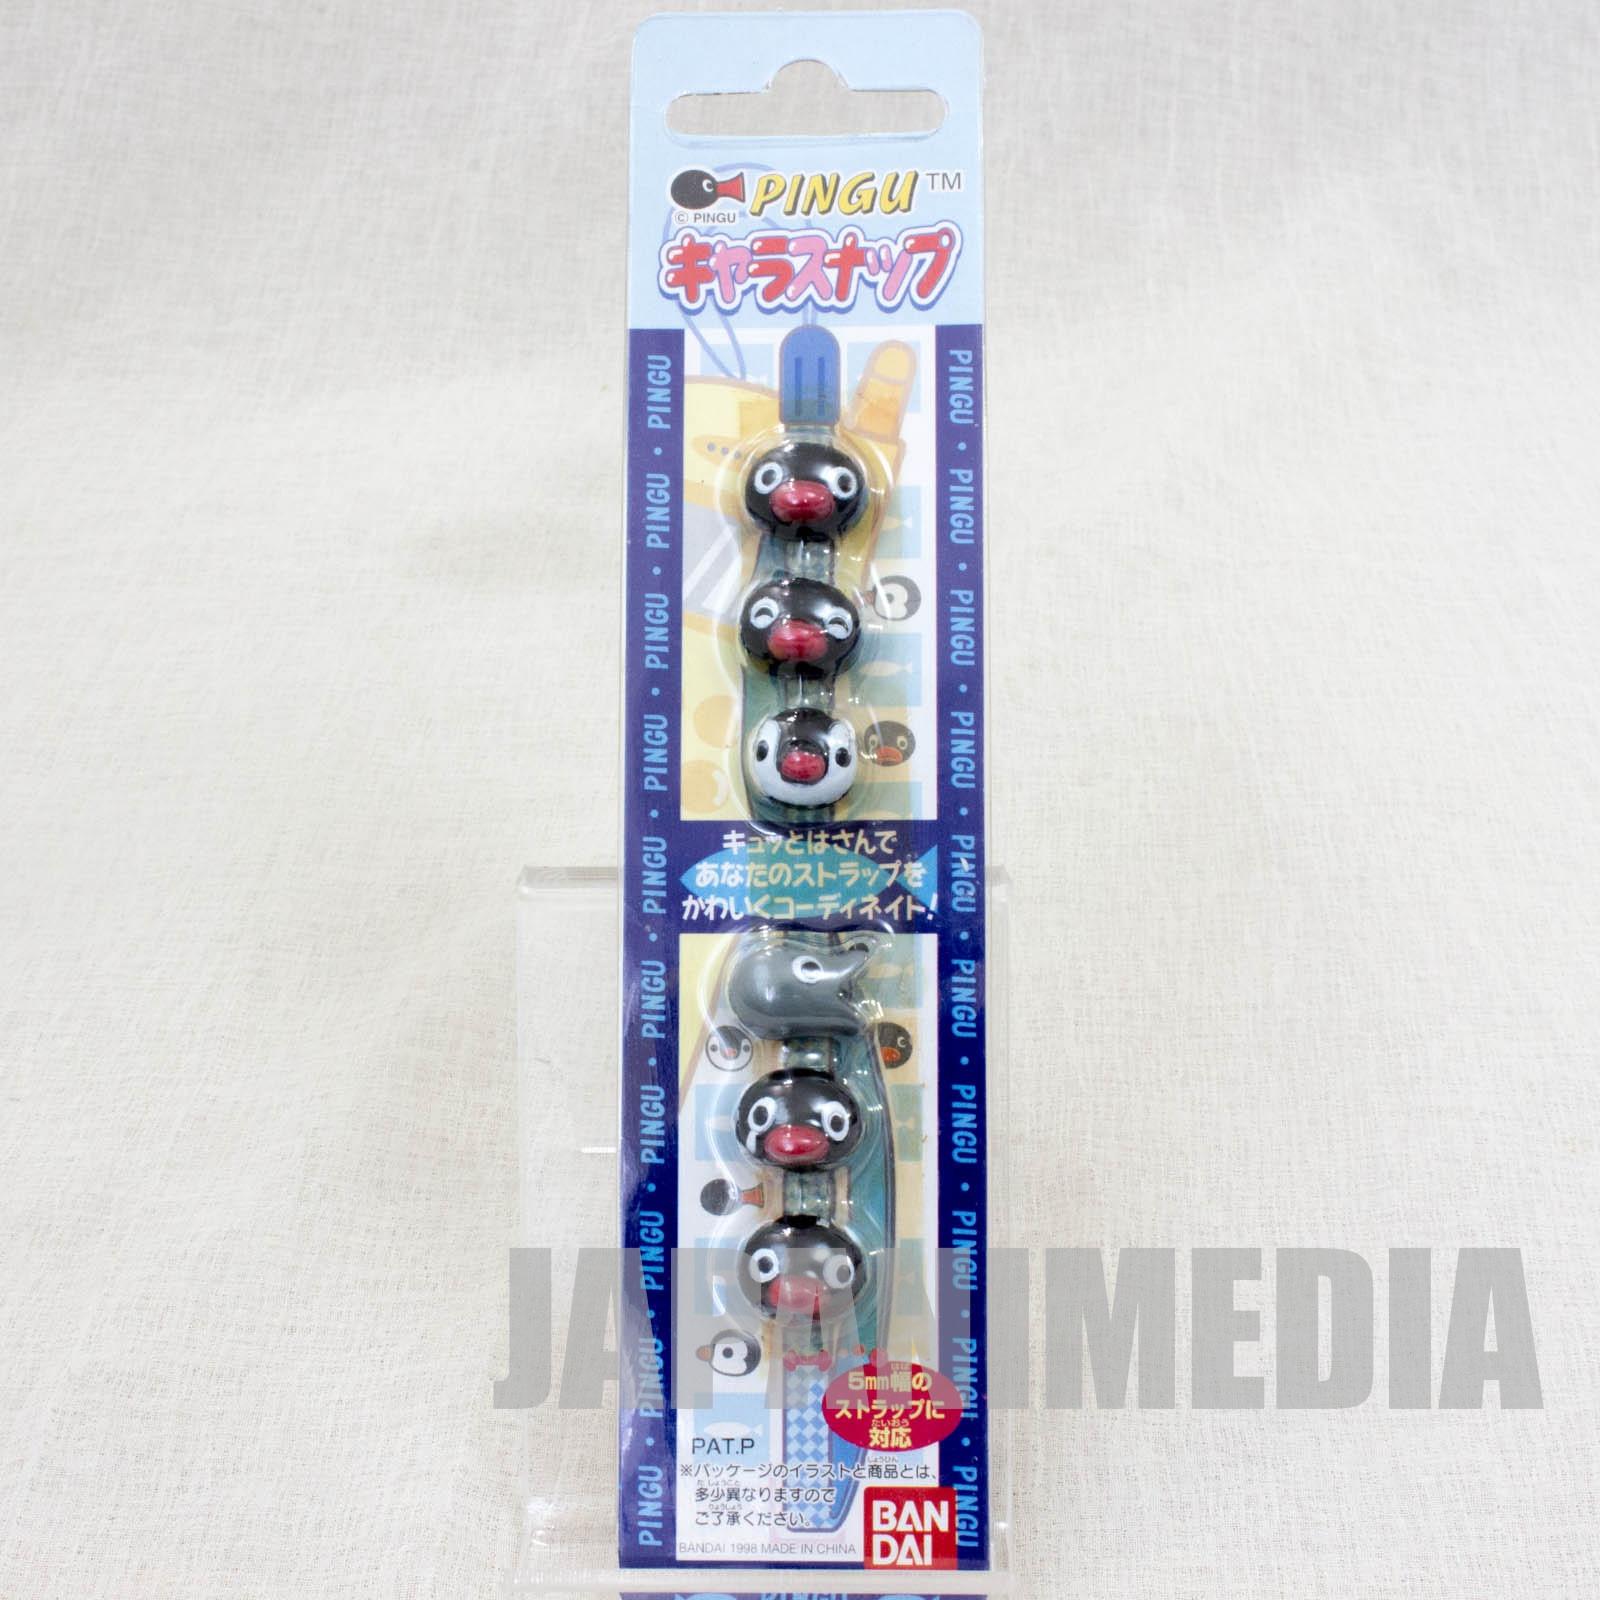 Pingu Chara Snap button 6pc Set [Pingu / Pinga / Robby] JAPAN ANIME